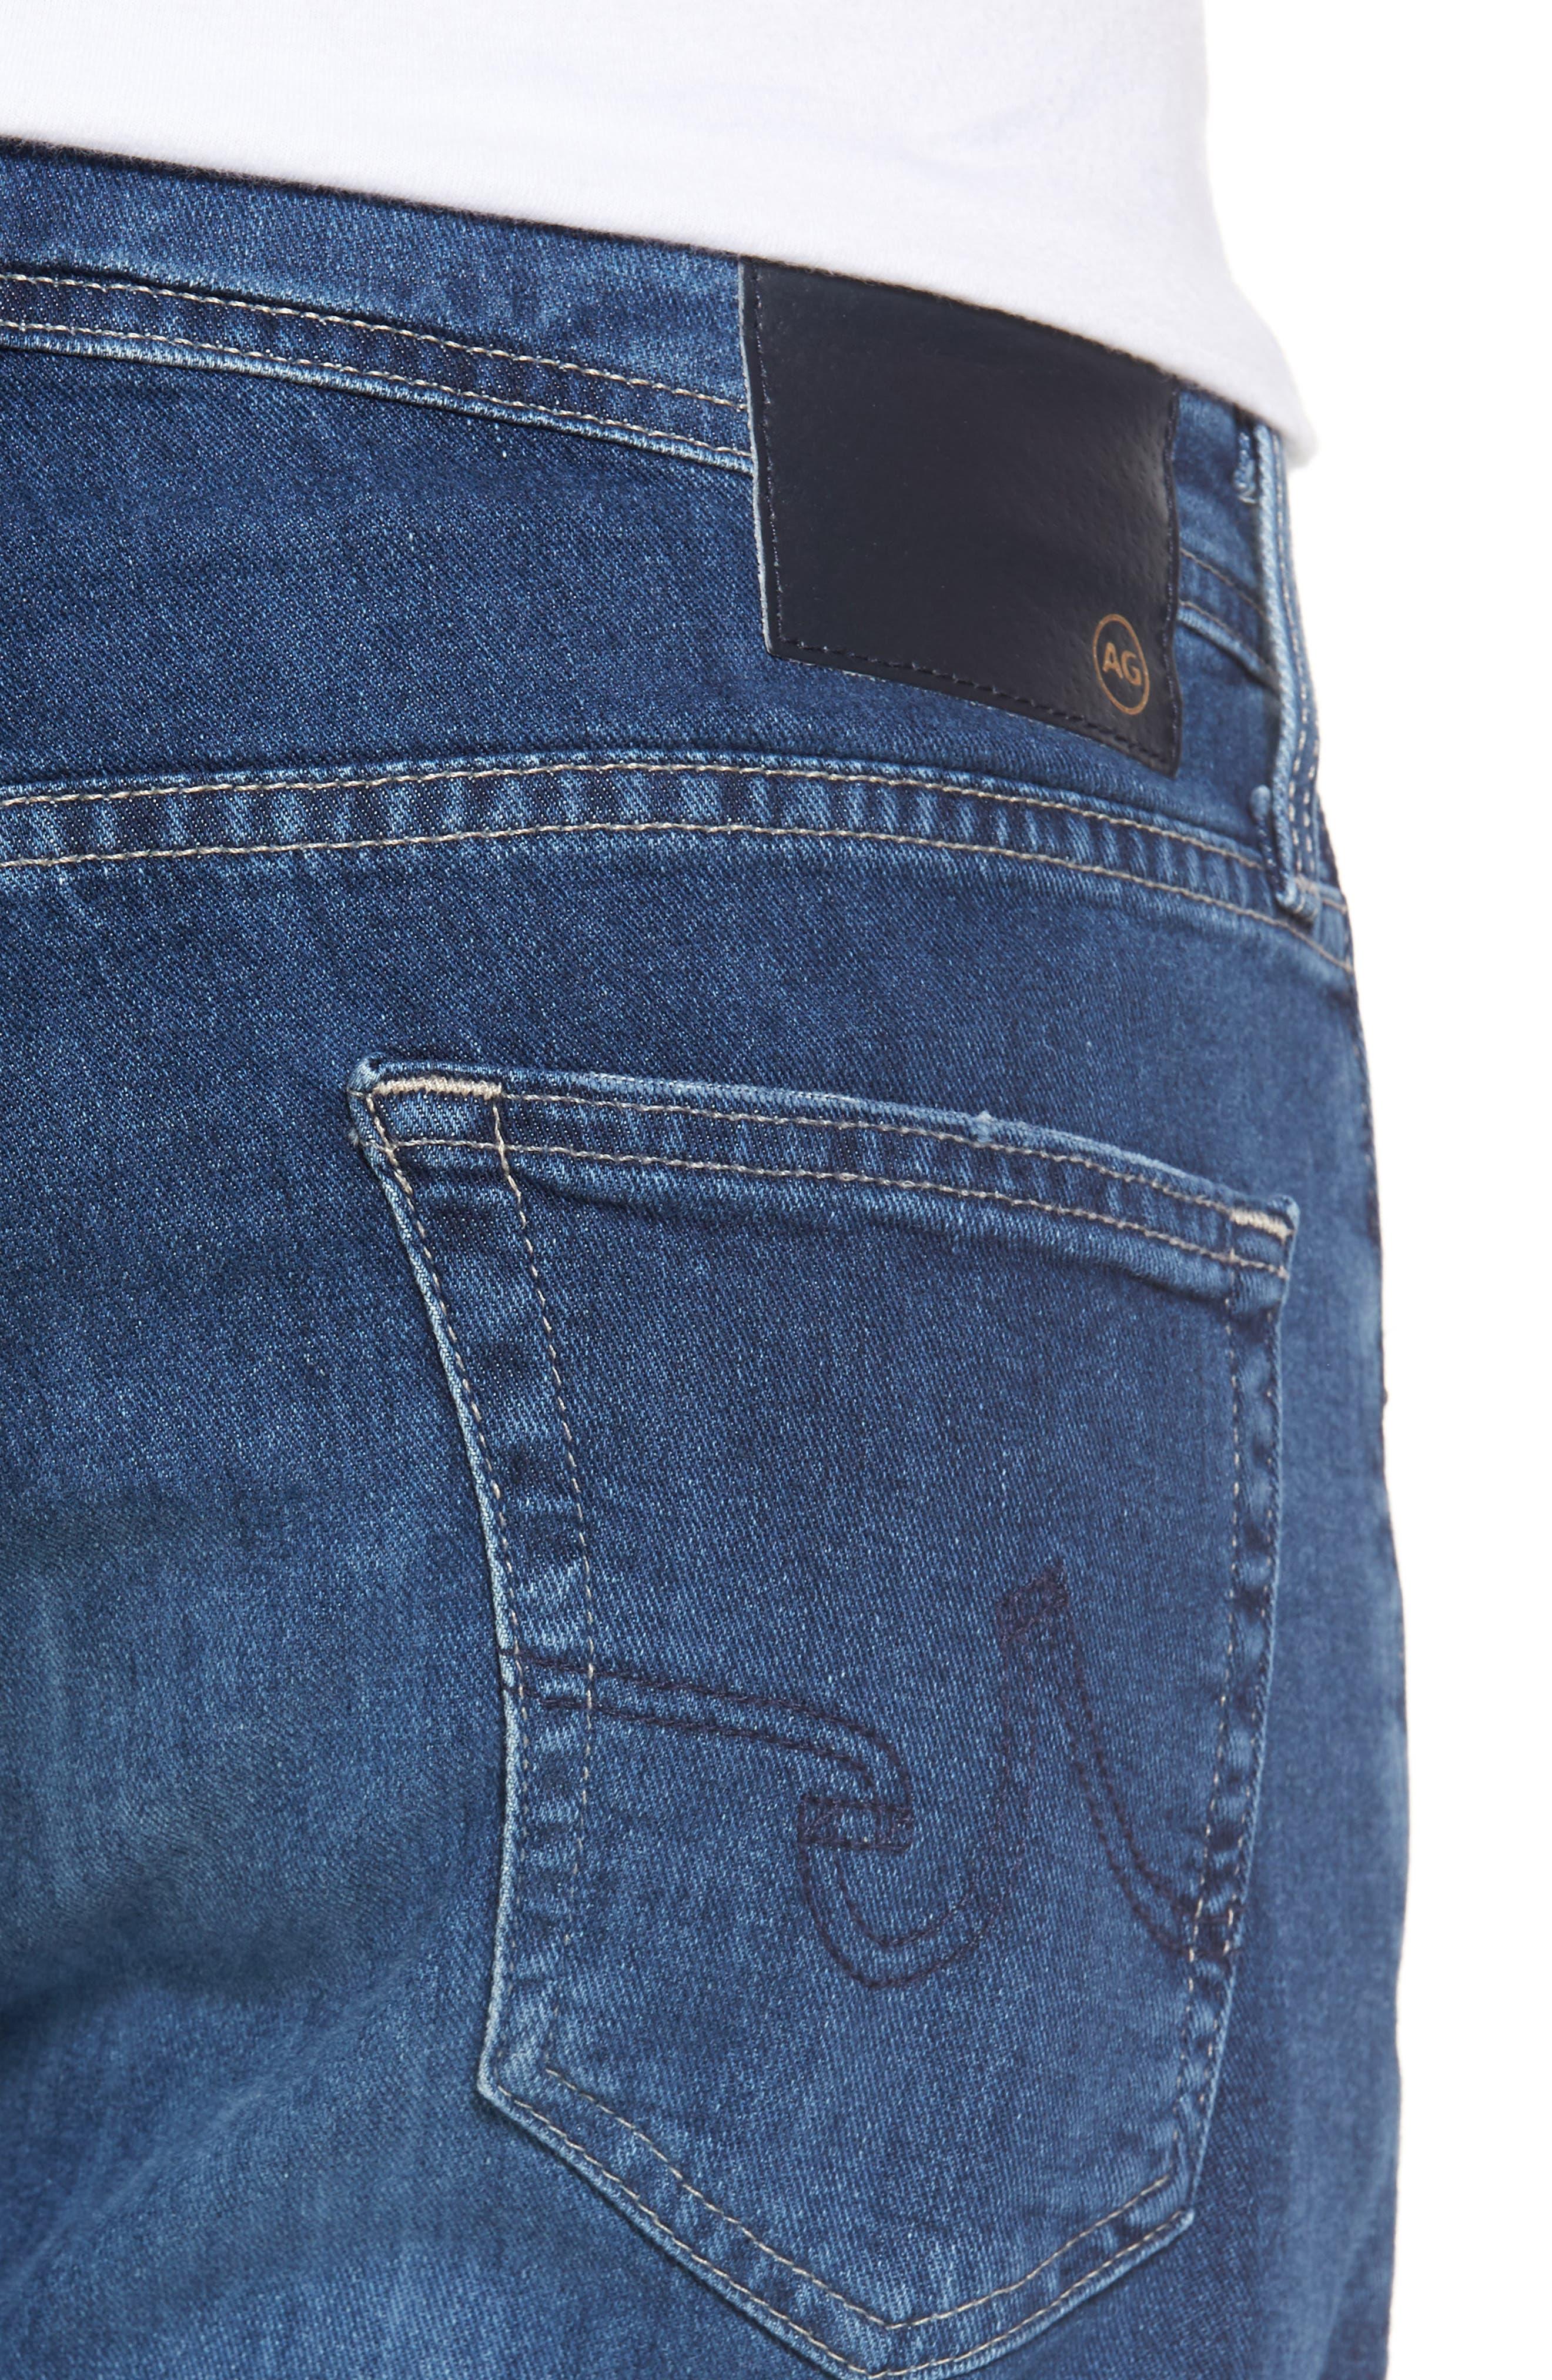 Ives Straight Leg Jeans,                             Alternate thumbnail 4, color,                             486